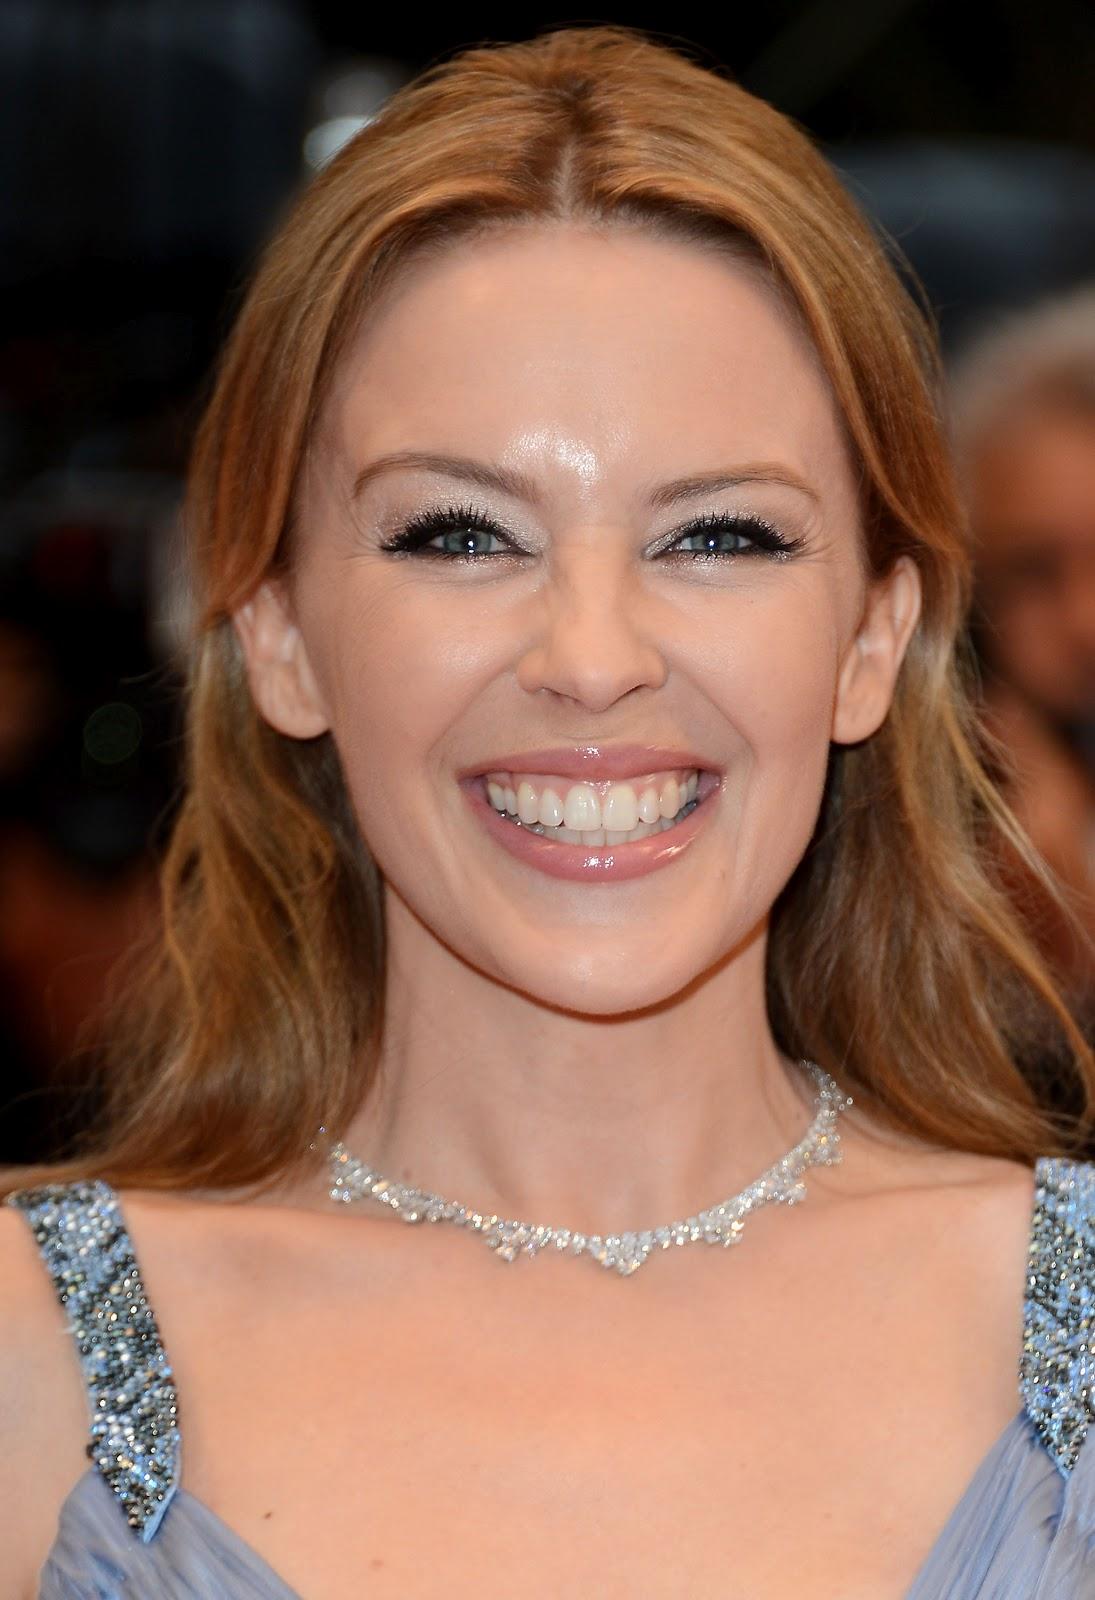 http://1.bp.blogspot.com/-WulGWhA7T5U/T8OV0oat0xI/AAAAAAAAHqw/YqaX-ySvRac/s1600/Kylie+Minogue+-+Cannes+-+27May2012-_HQ_+_1_.jpg